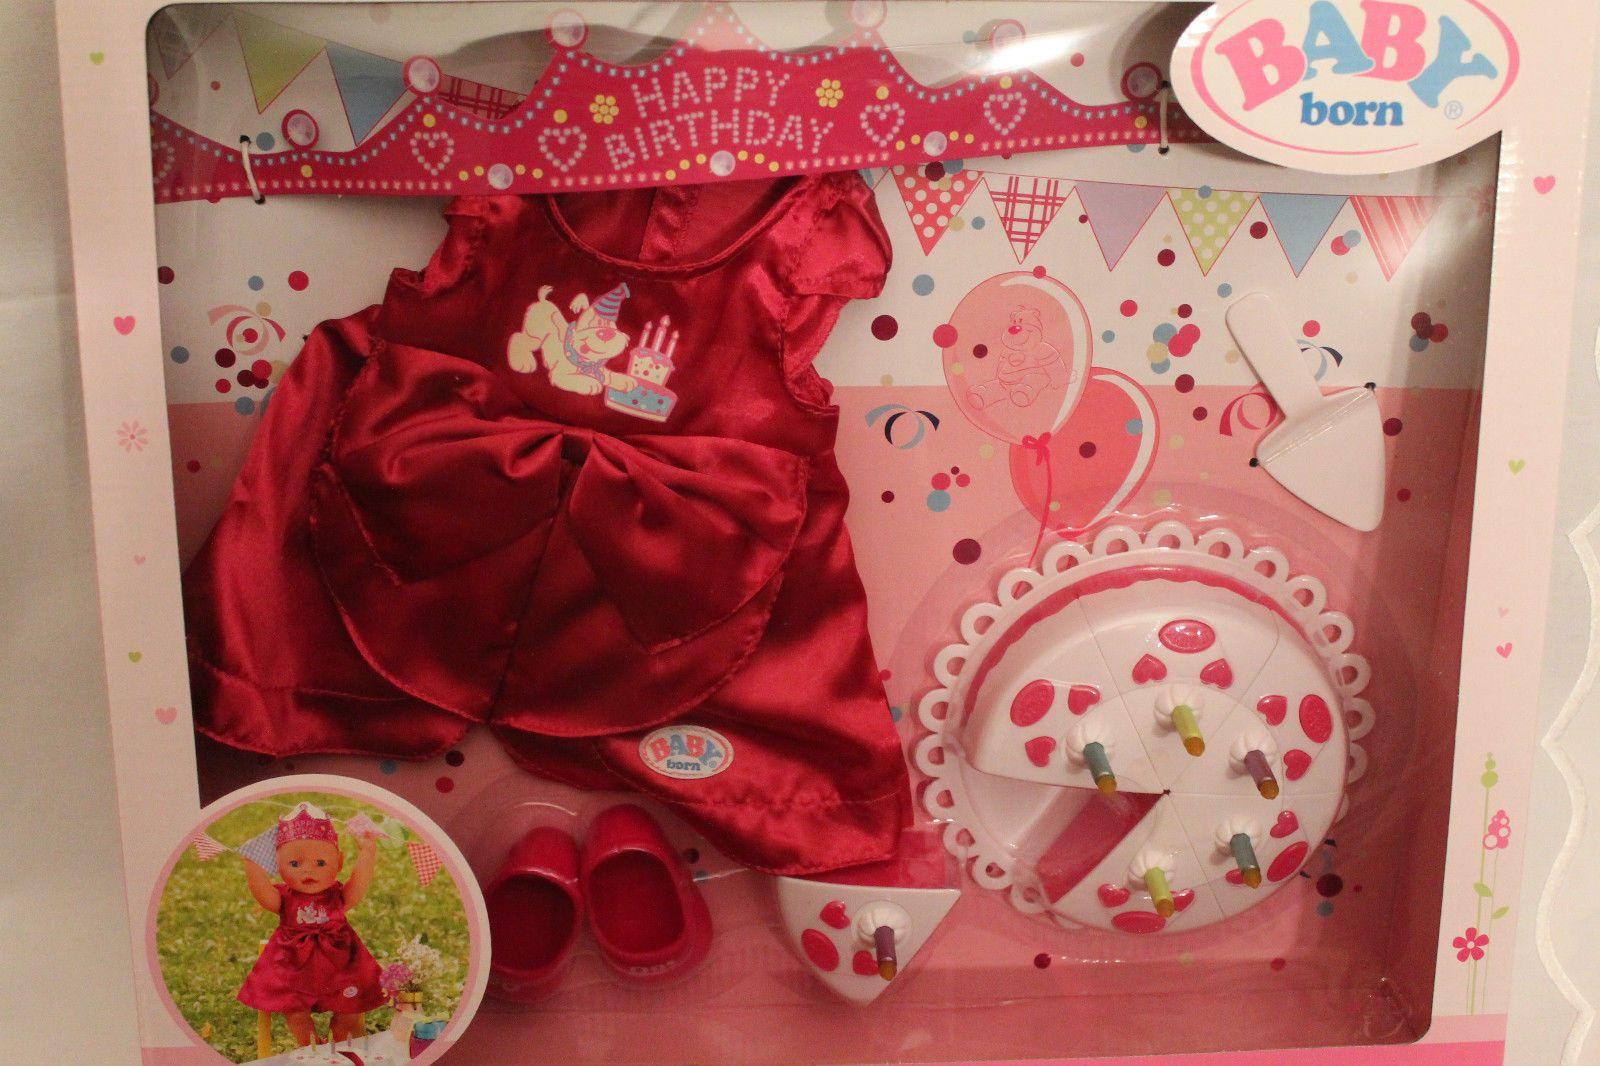 Zapf Creation Baby Born Deluxe Geburtstags Set Neu Ovp In Spielzeug Puppen Zubehor Babypuppen Zubehor Ebay